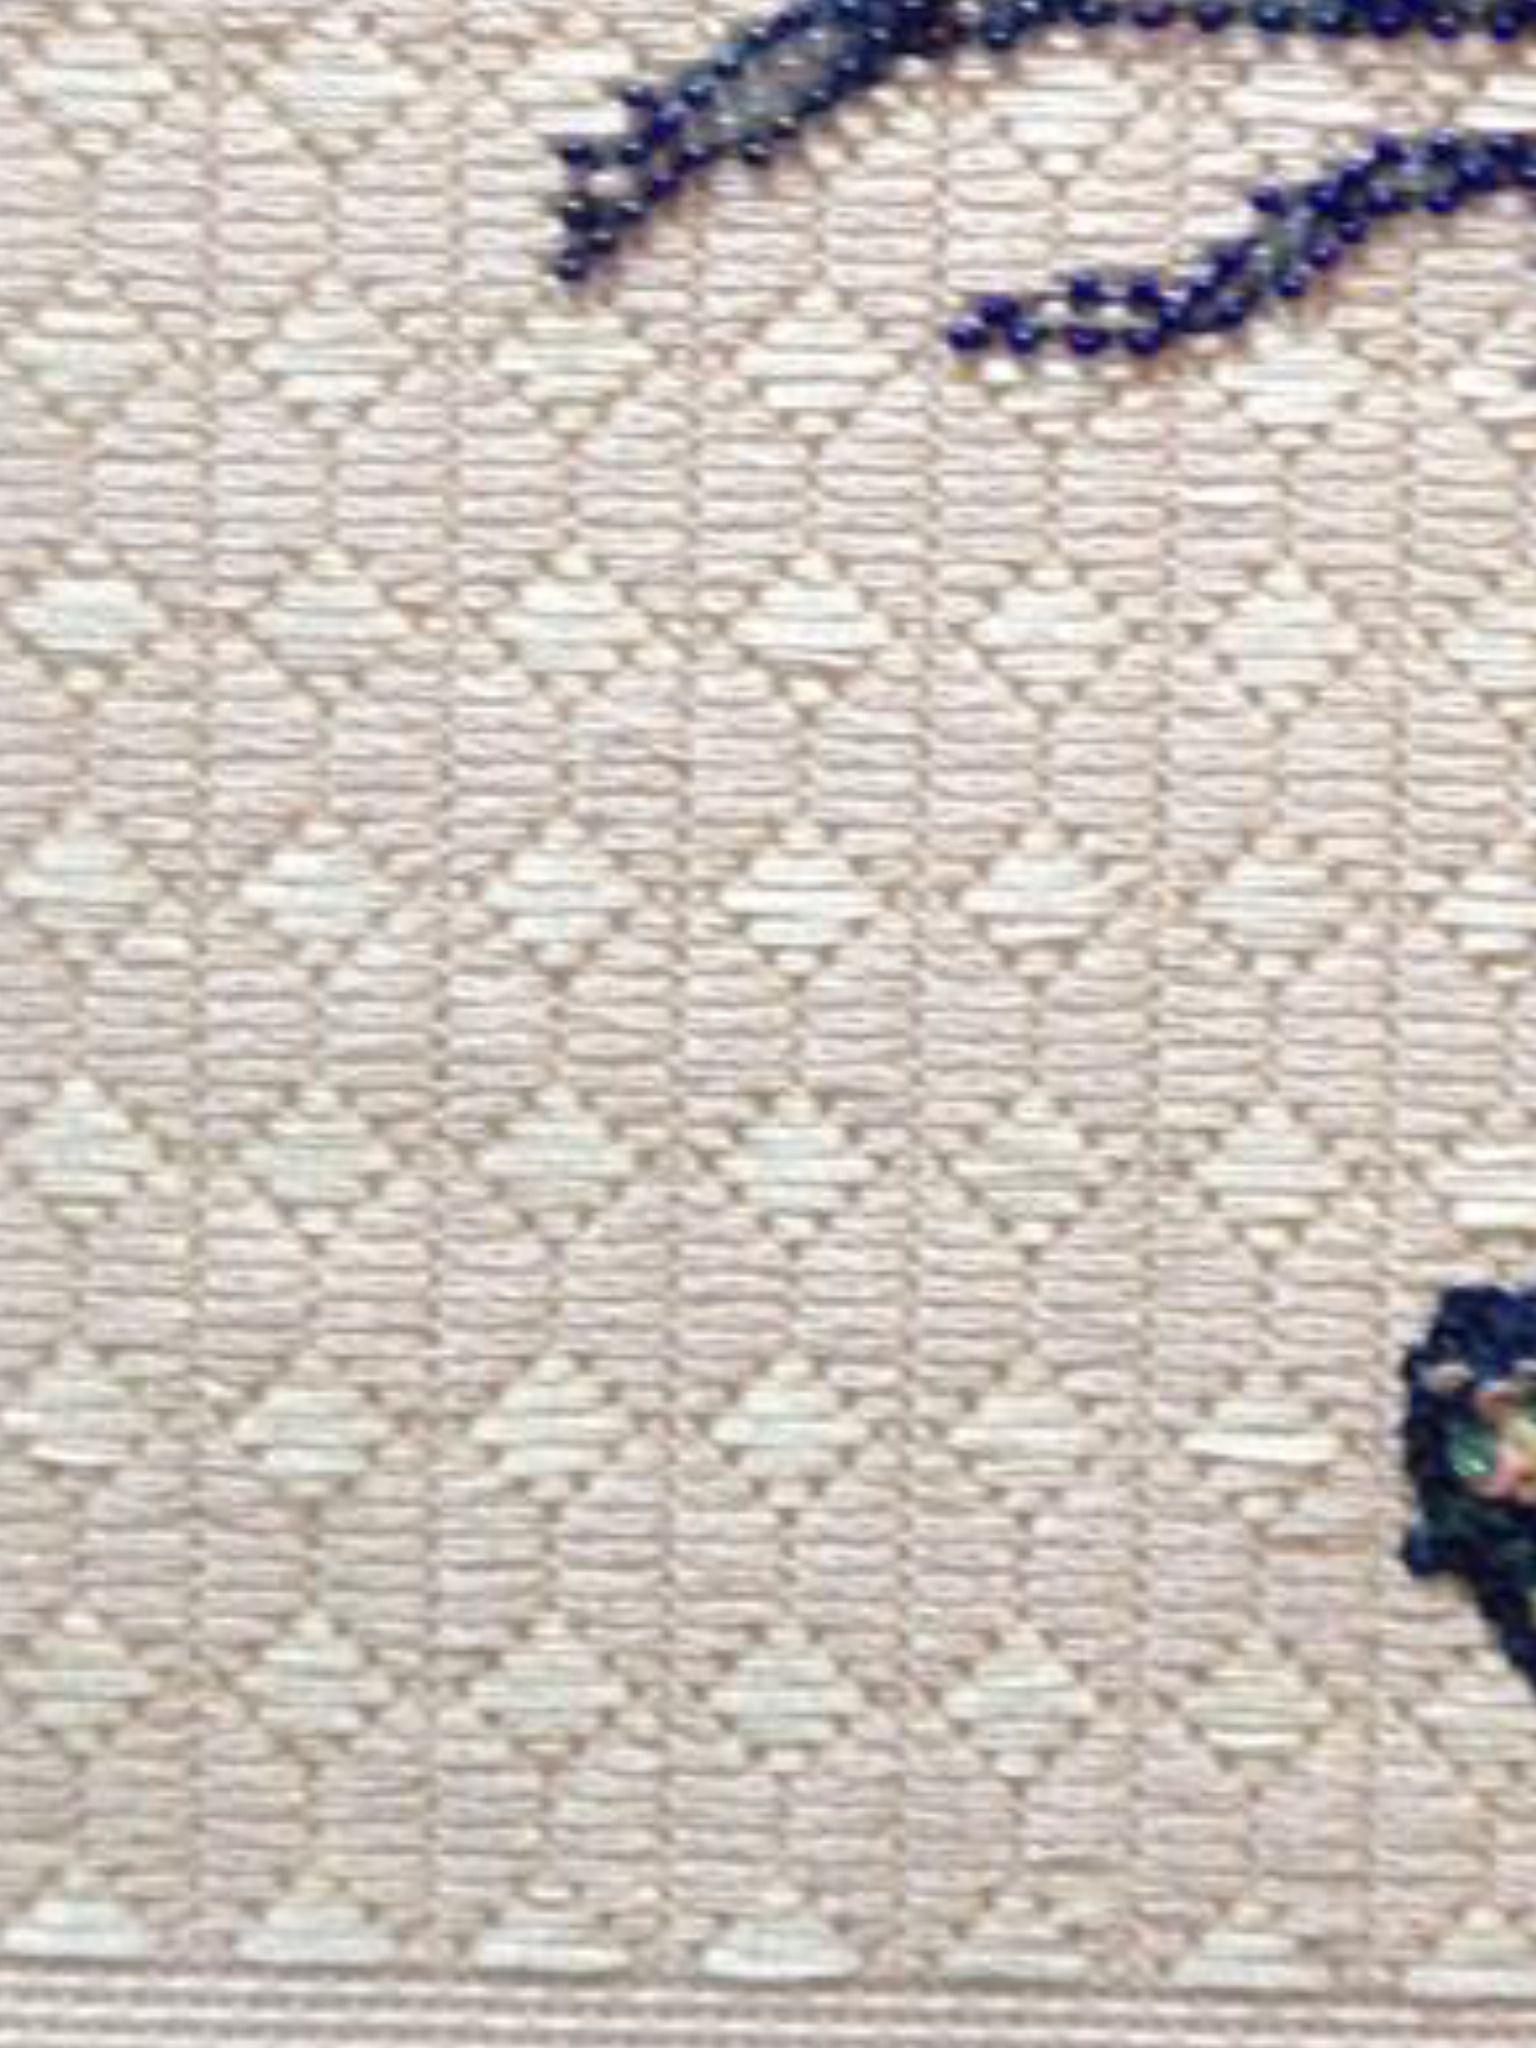 Great Background Stitch Needlepoint Stitches Needlepoint Patterns Bargello Needlepoint